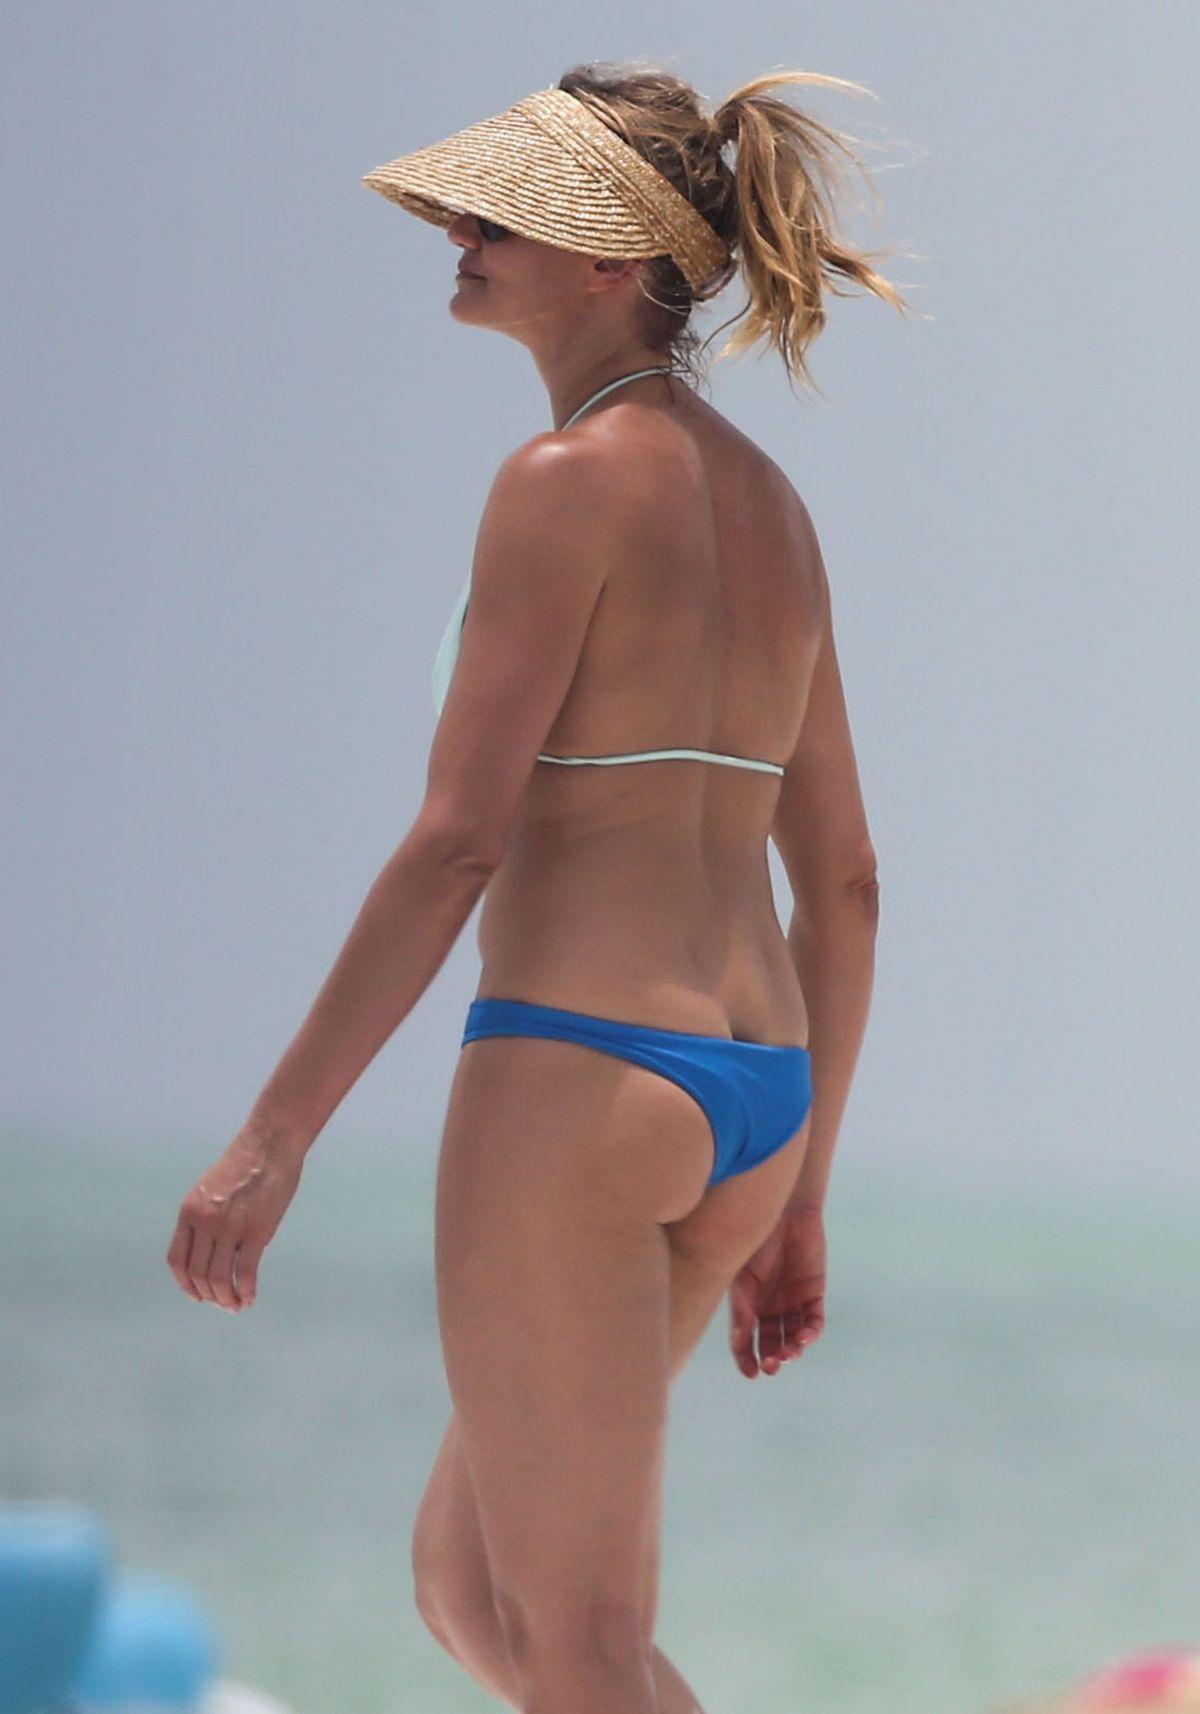 CAMERON DIAZ in Bikini at a Beach in Florida - HawtCelebs ... Cameron Diaz Florida